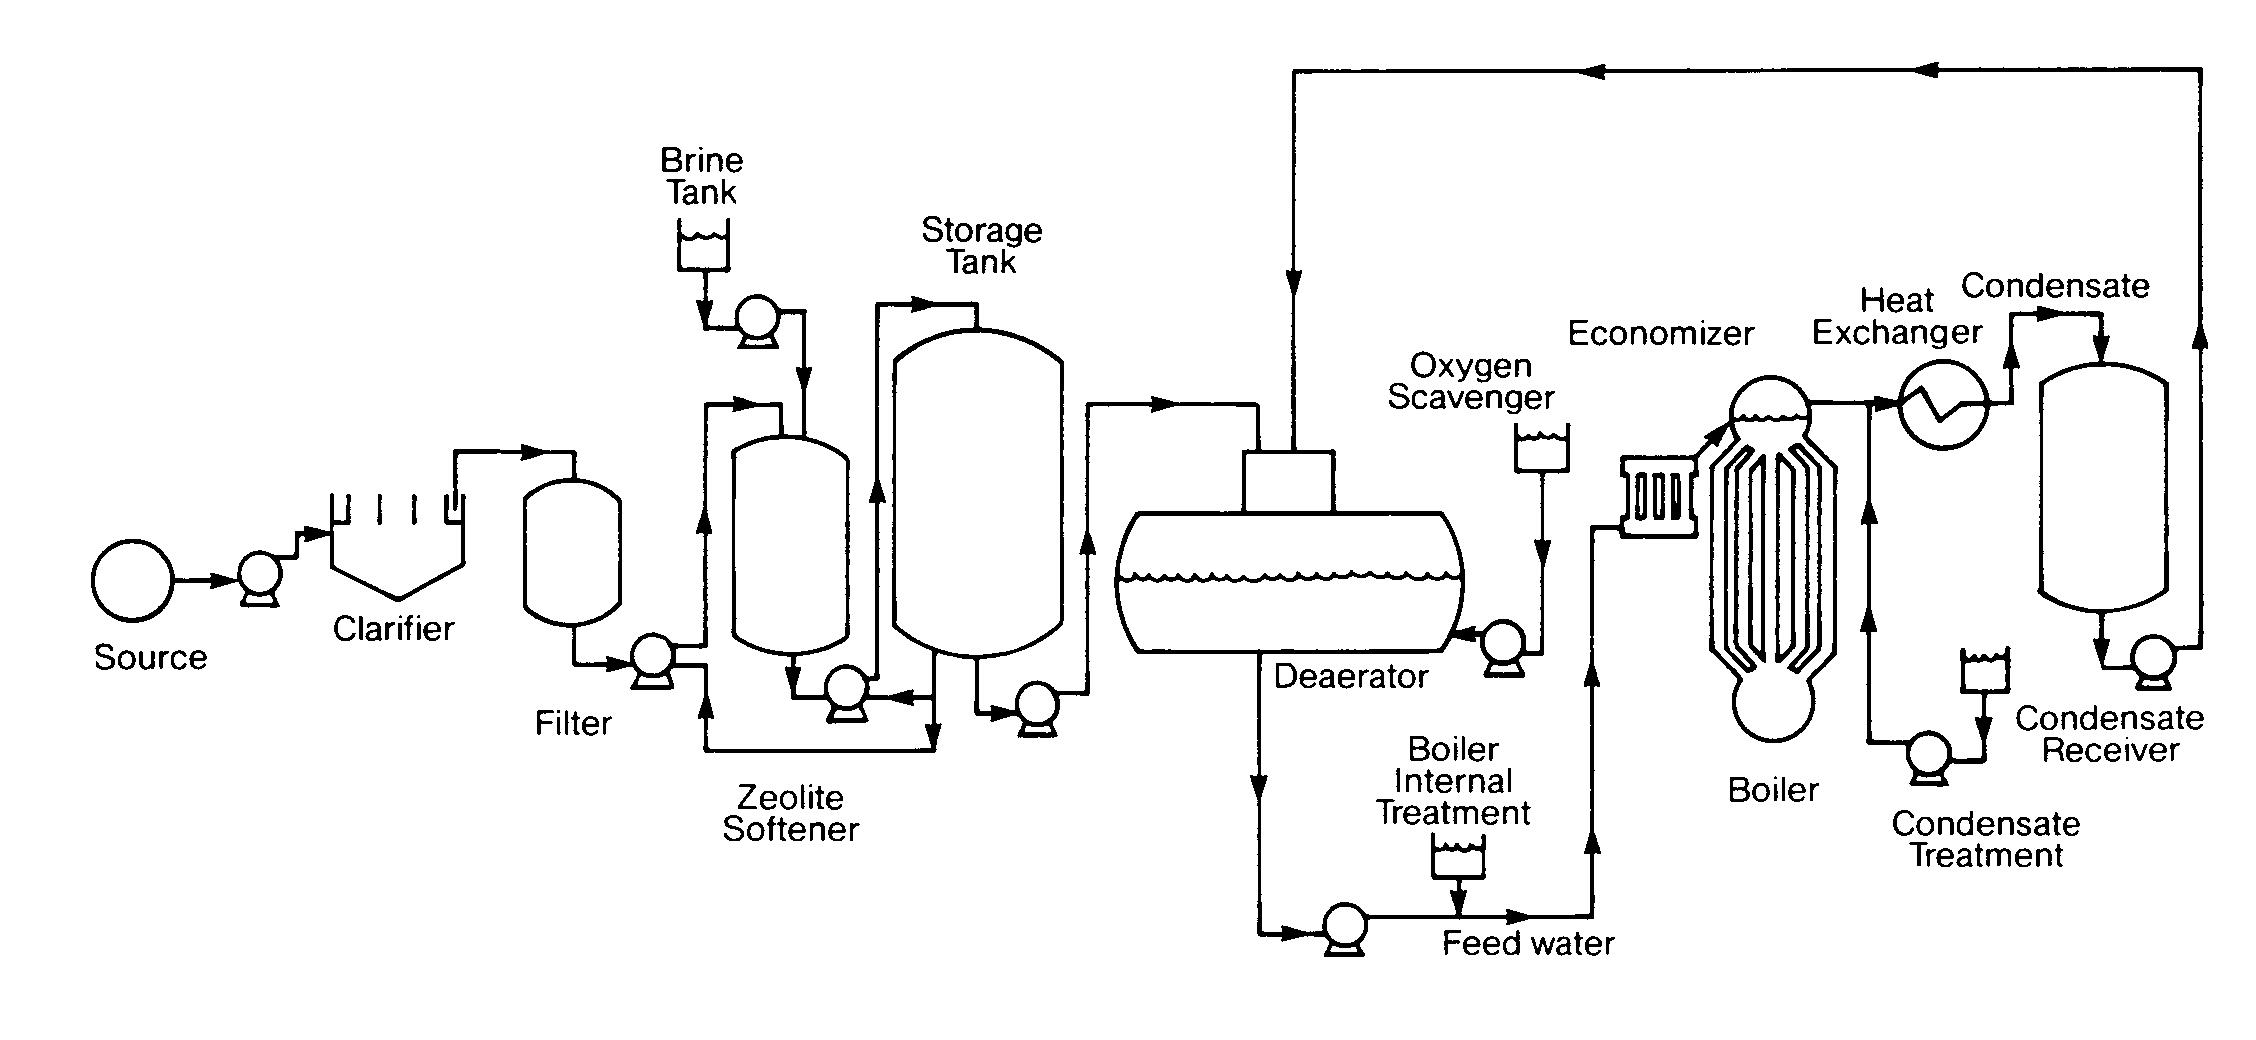 fire tube boiler process flow diagram